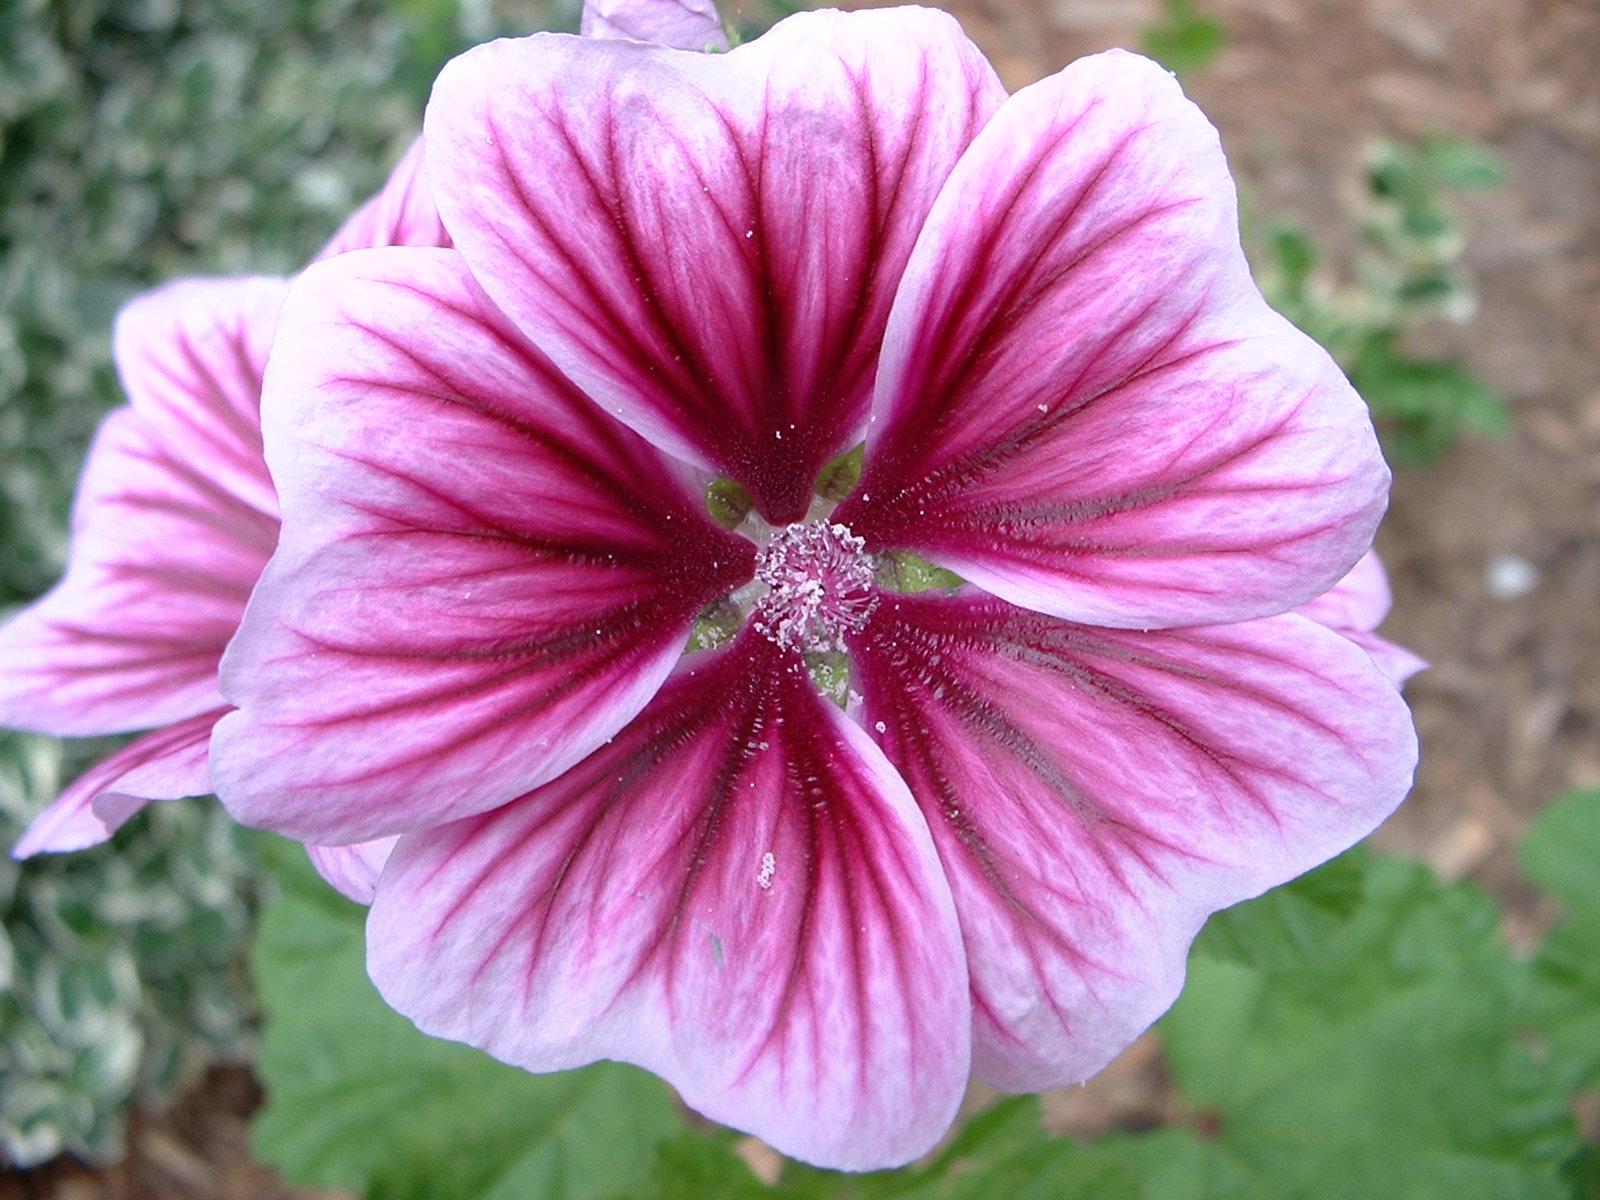 Fileperennial Geranium Flower Relic38g Wikimedia Commons